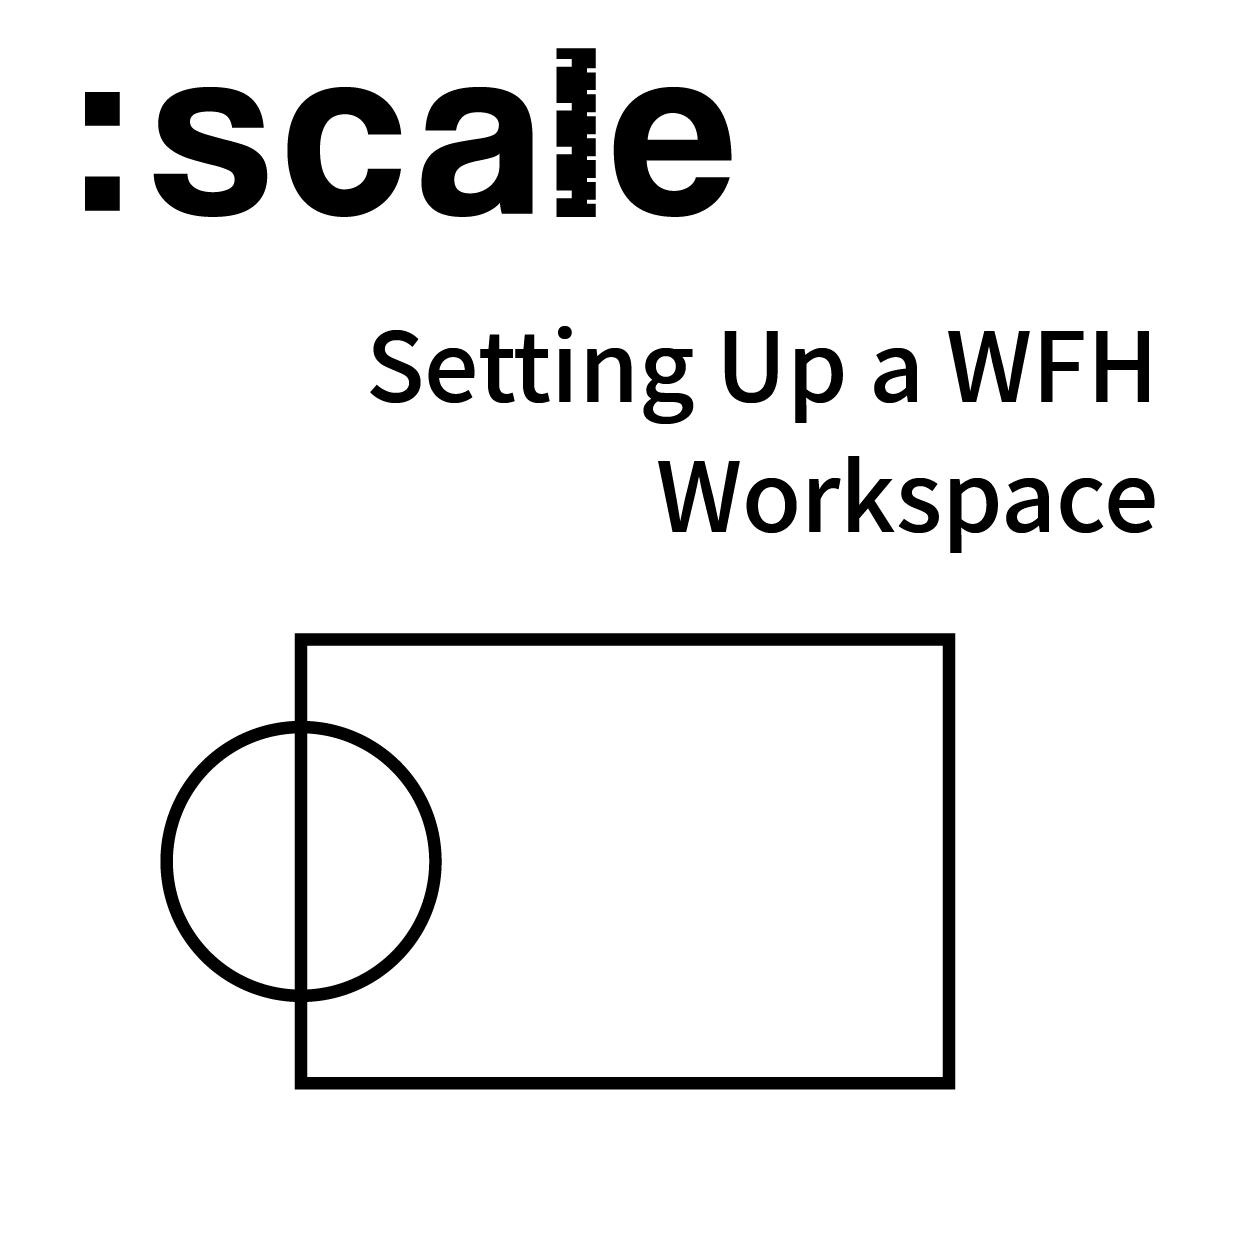 WFHWorkspace-01